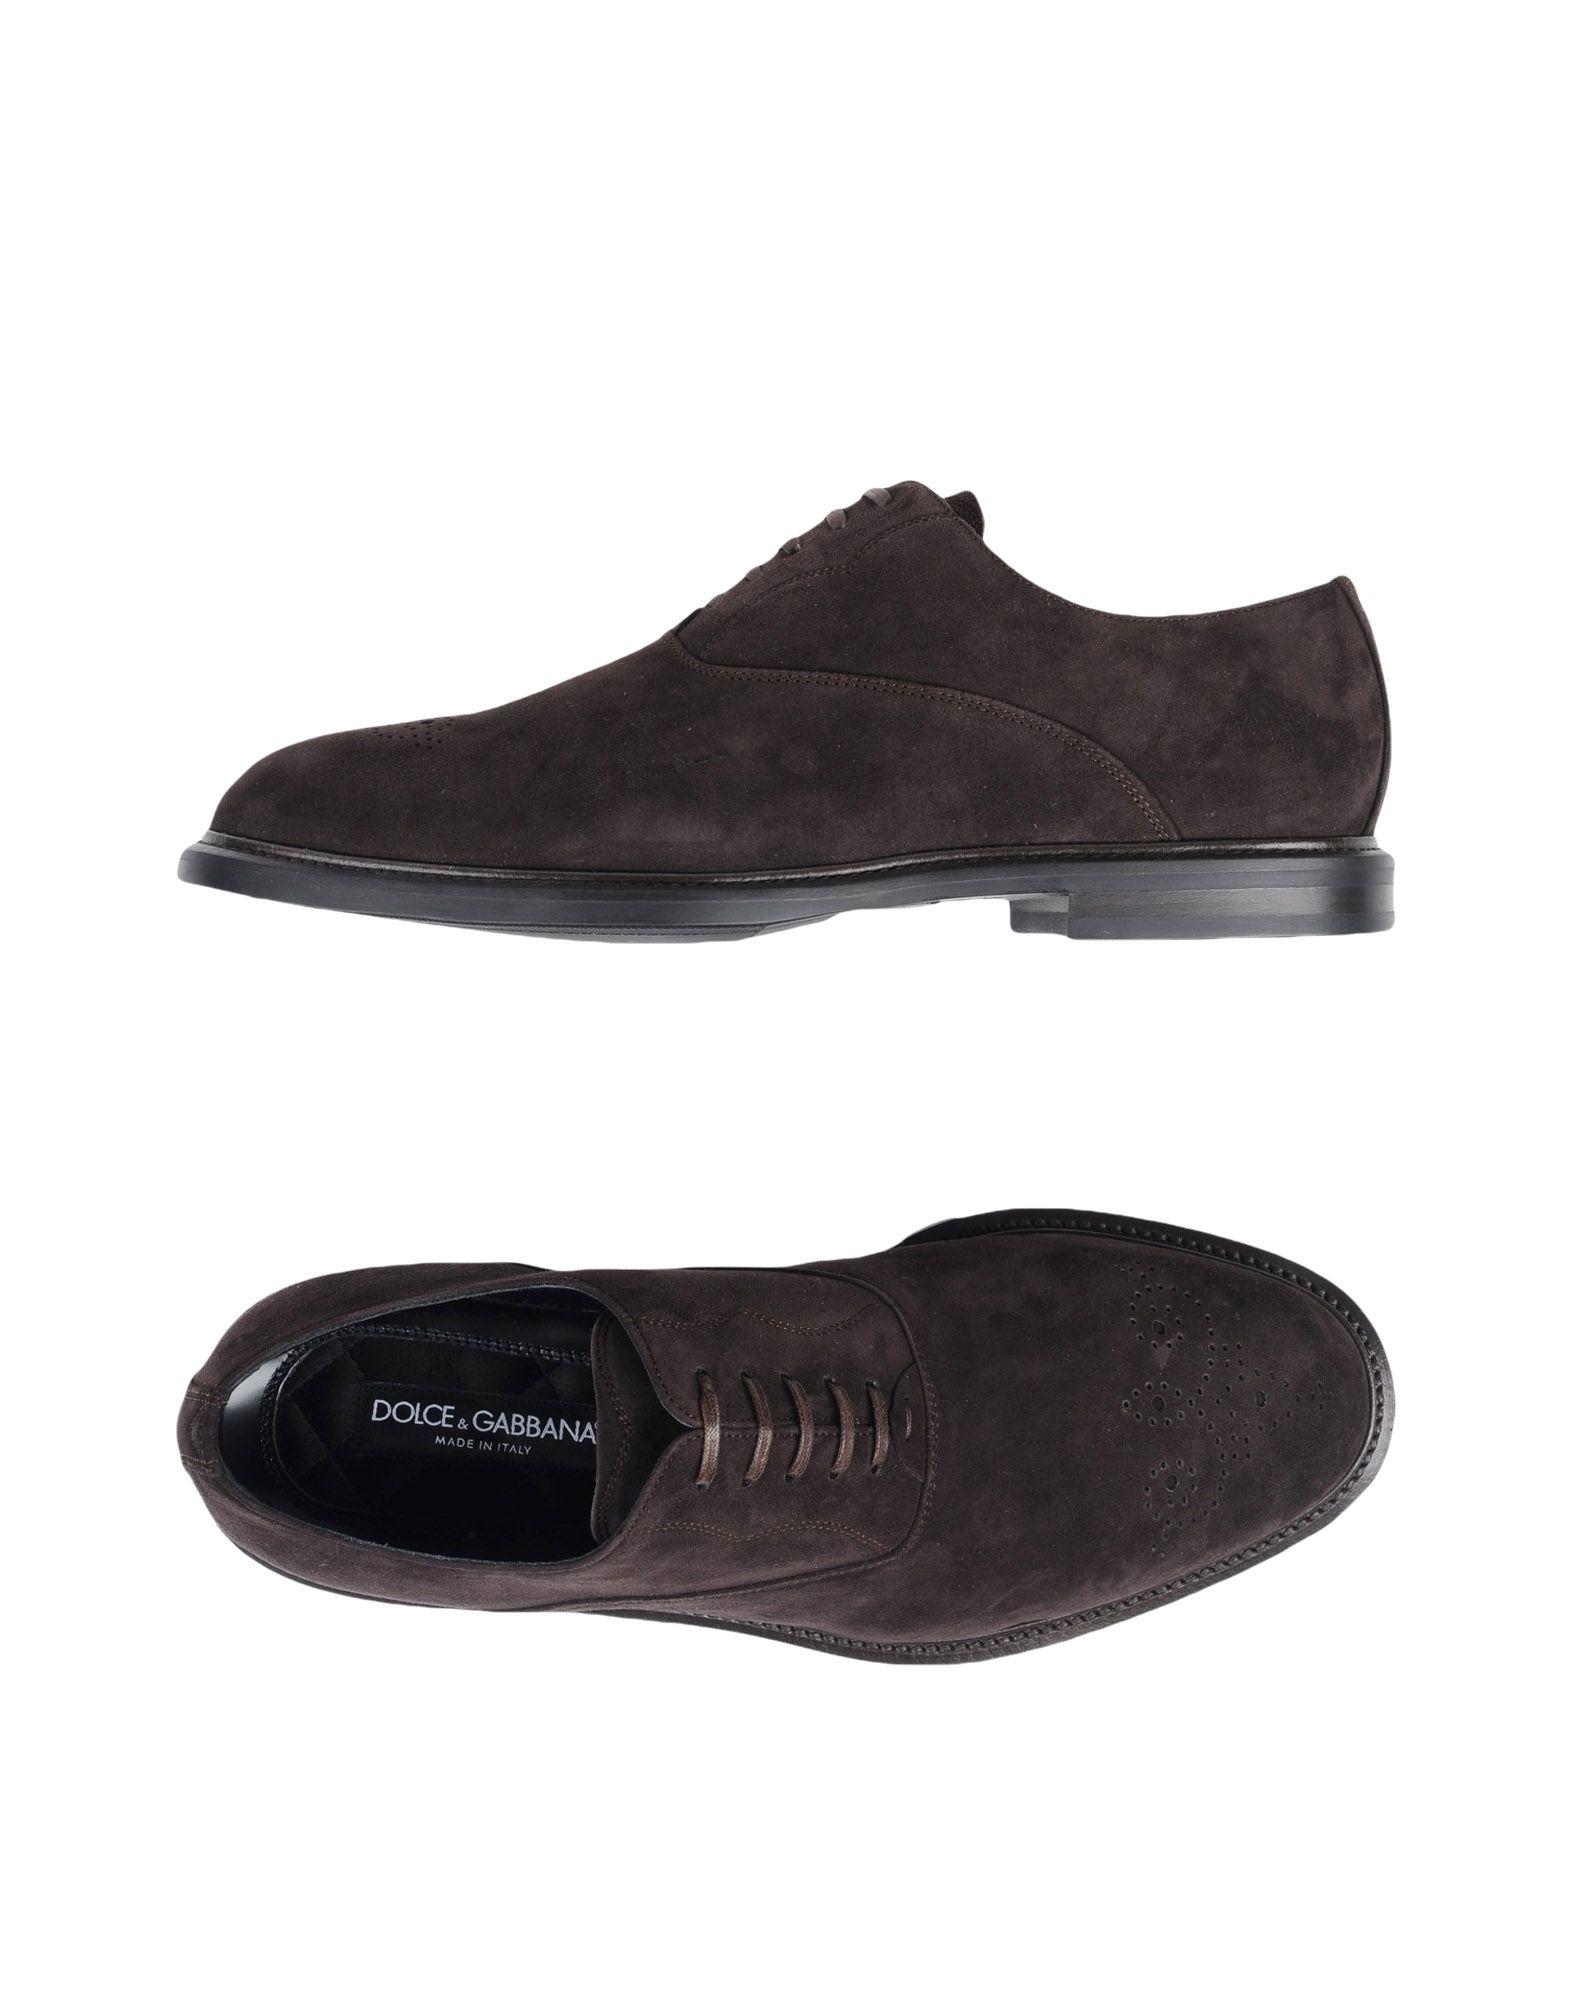 Dolce & Gabbana Schnürschuhe Herren  11466060XU Gute Qualität beliebte Schuhe